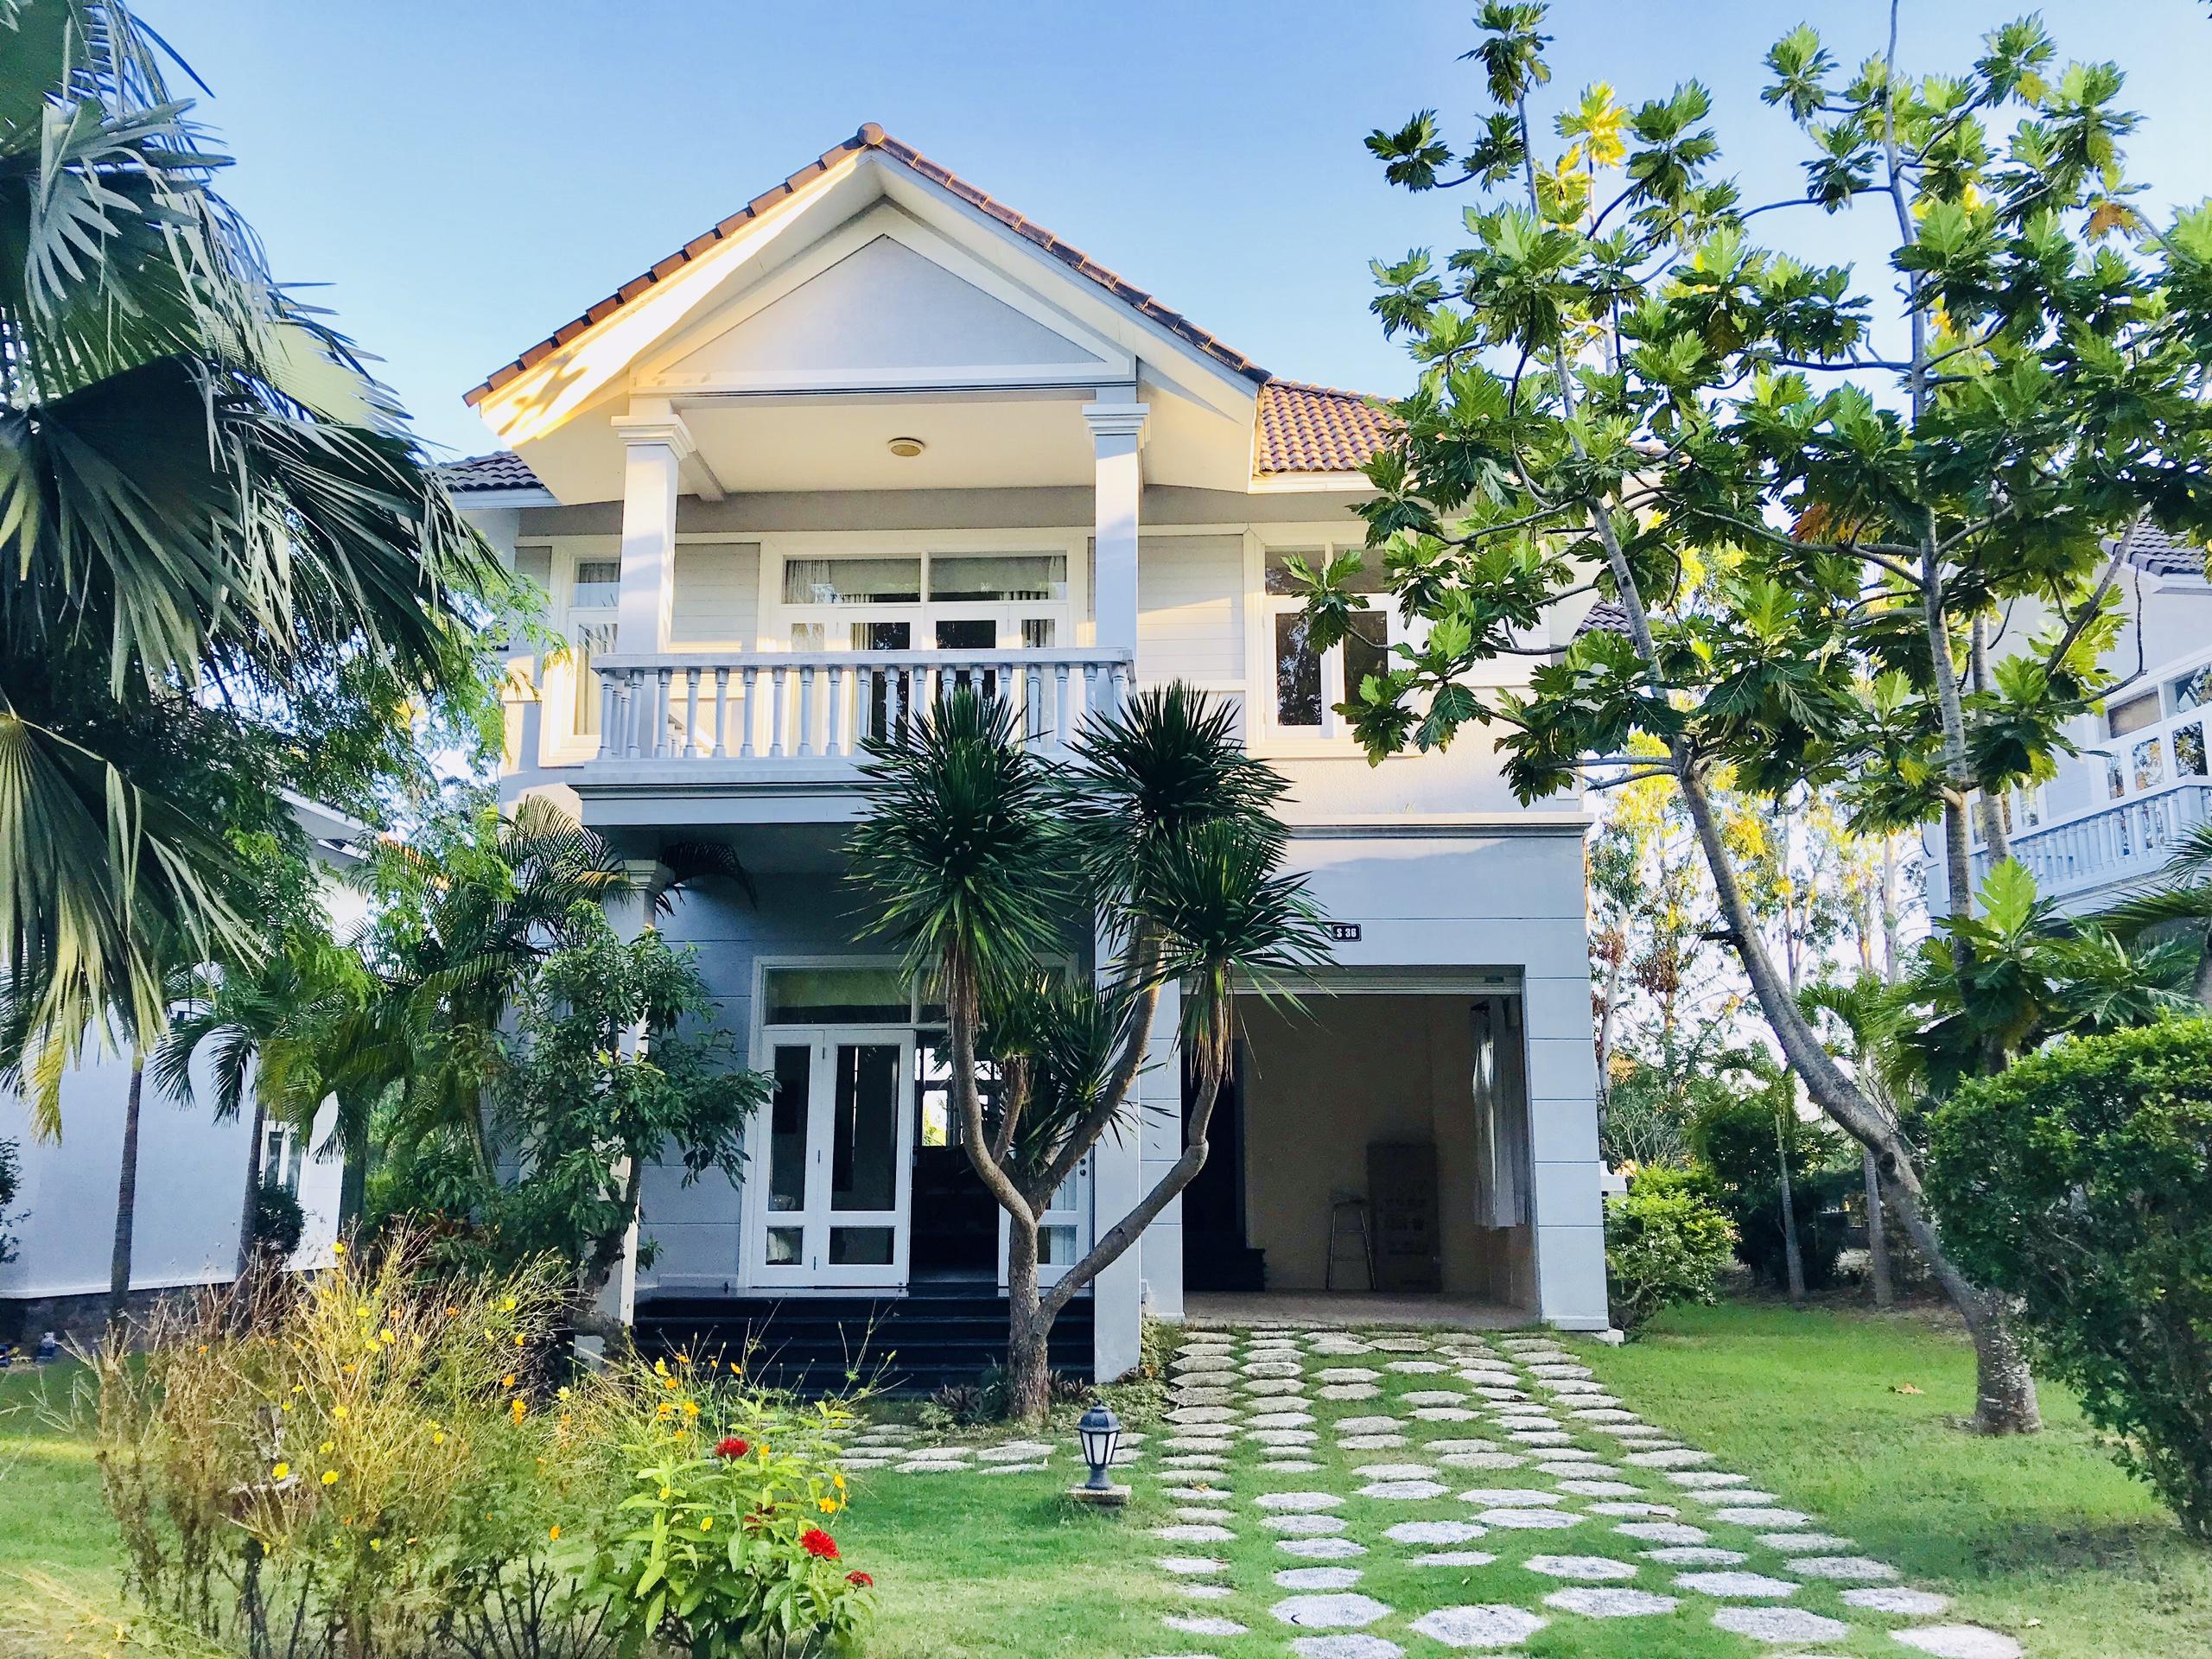 S57 Villa Phan Thiết